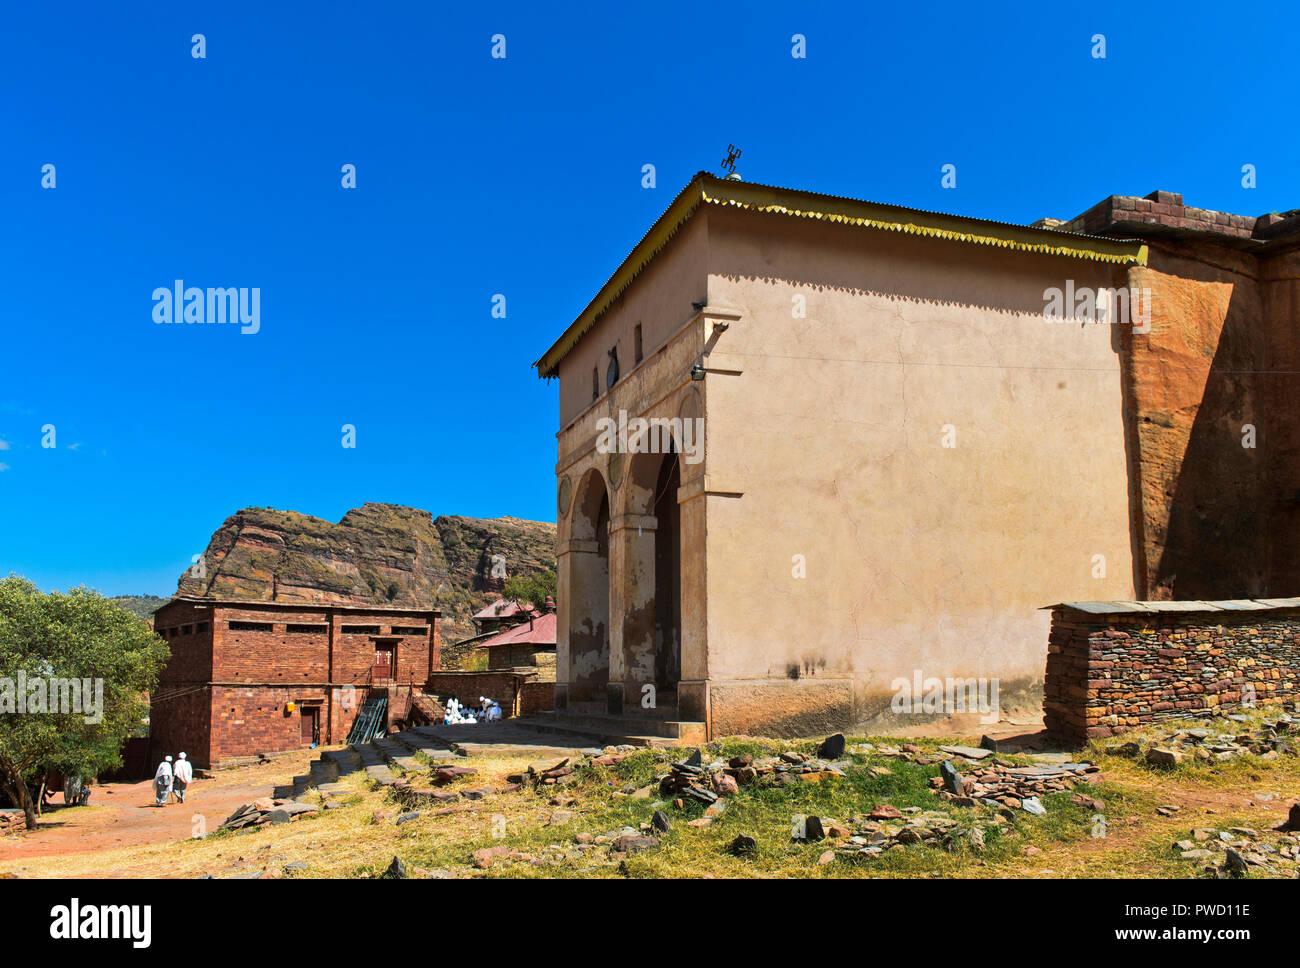 Entrance hall of the semi-monolithic church Abreha wa Atsbeha near Wukro, Tigray, Ethiopia - Stock Image